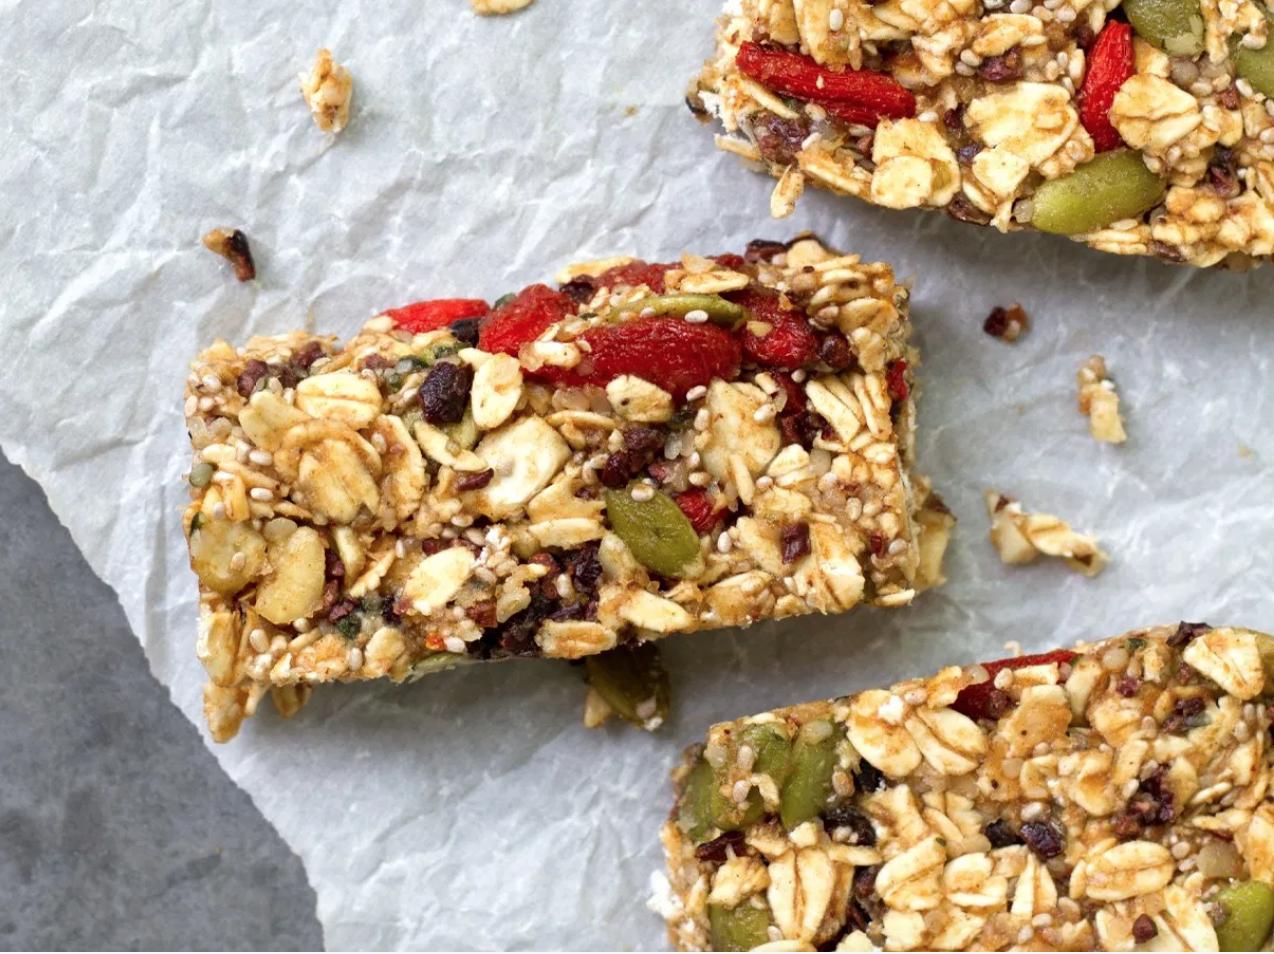 Raw Superfood Granola Bars